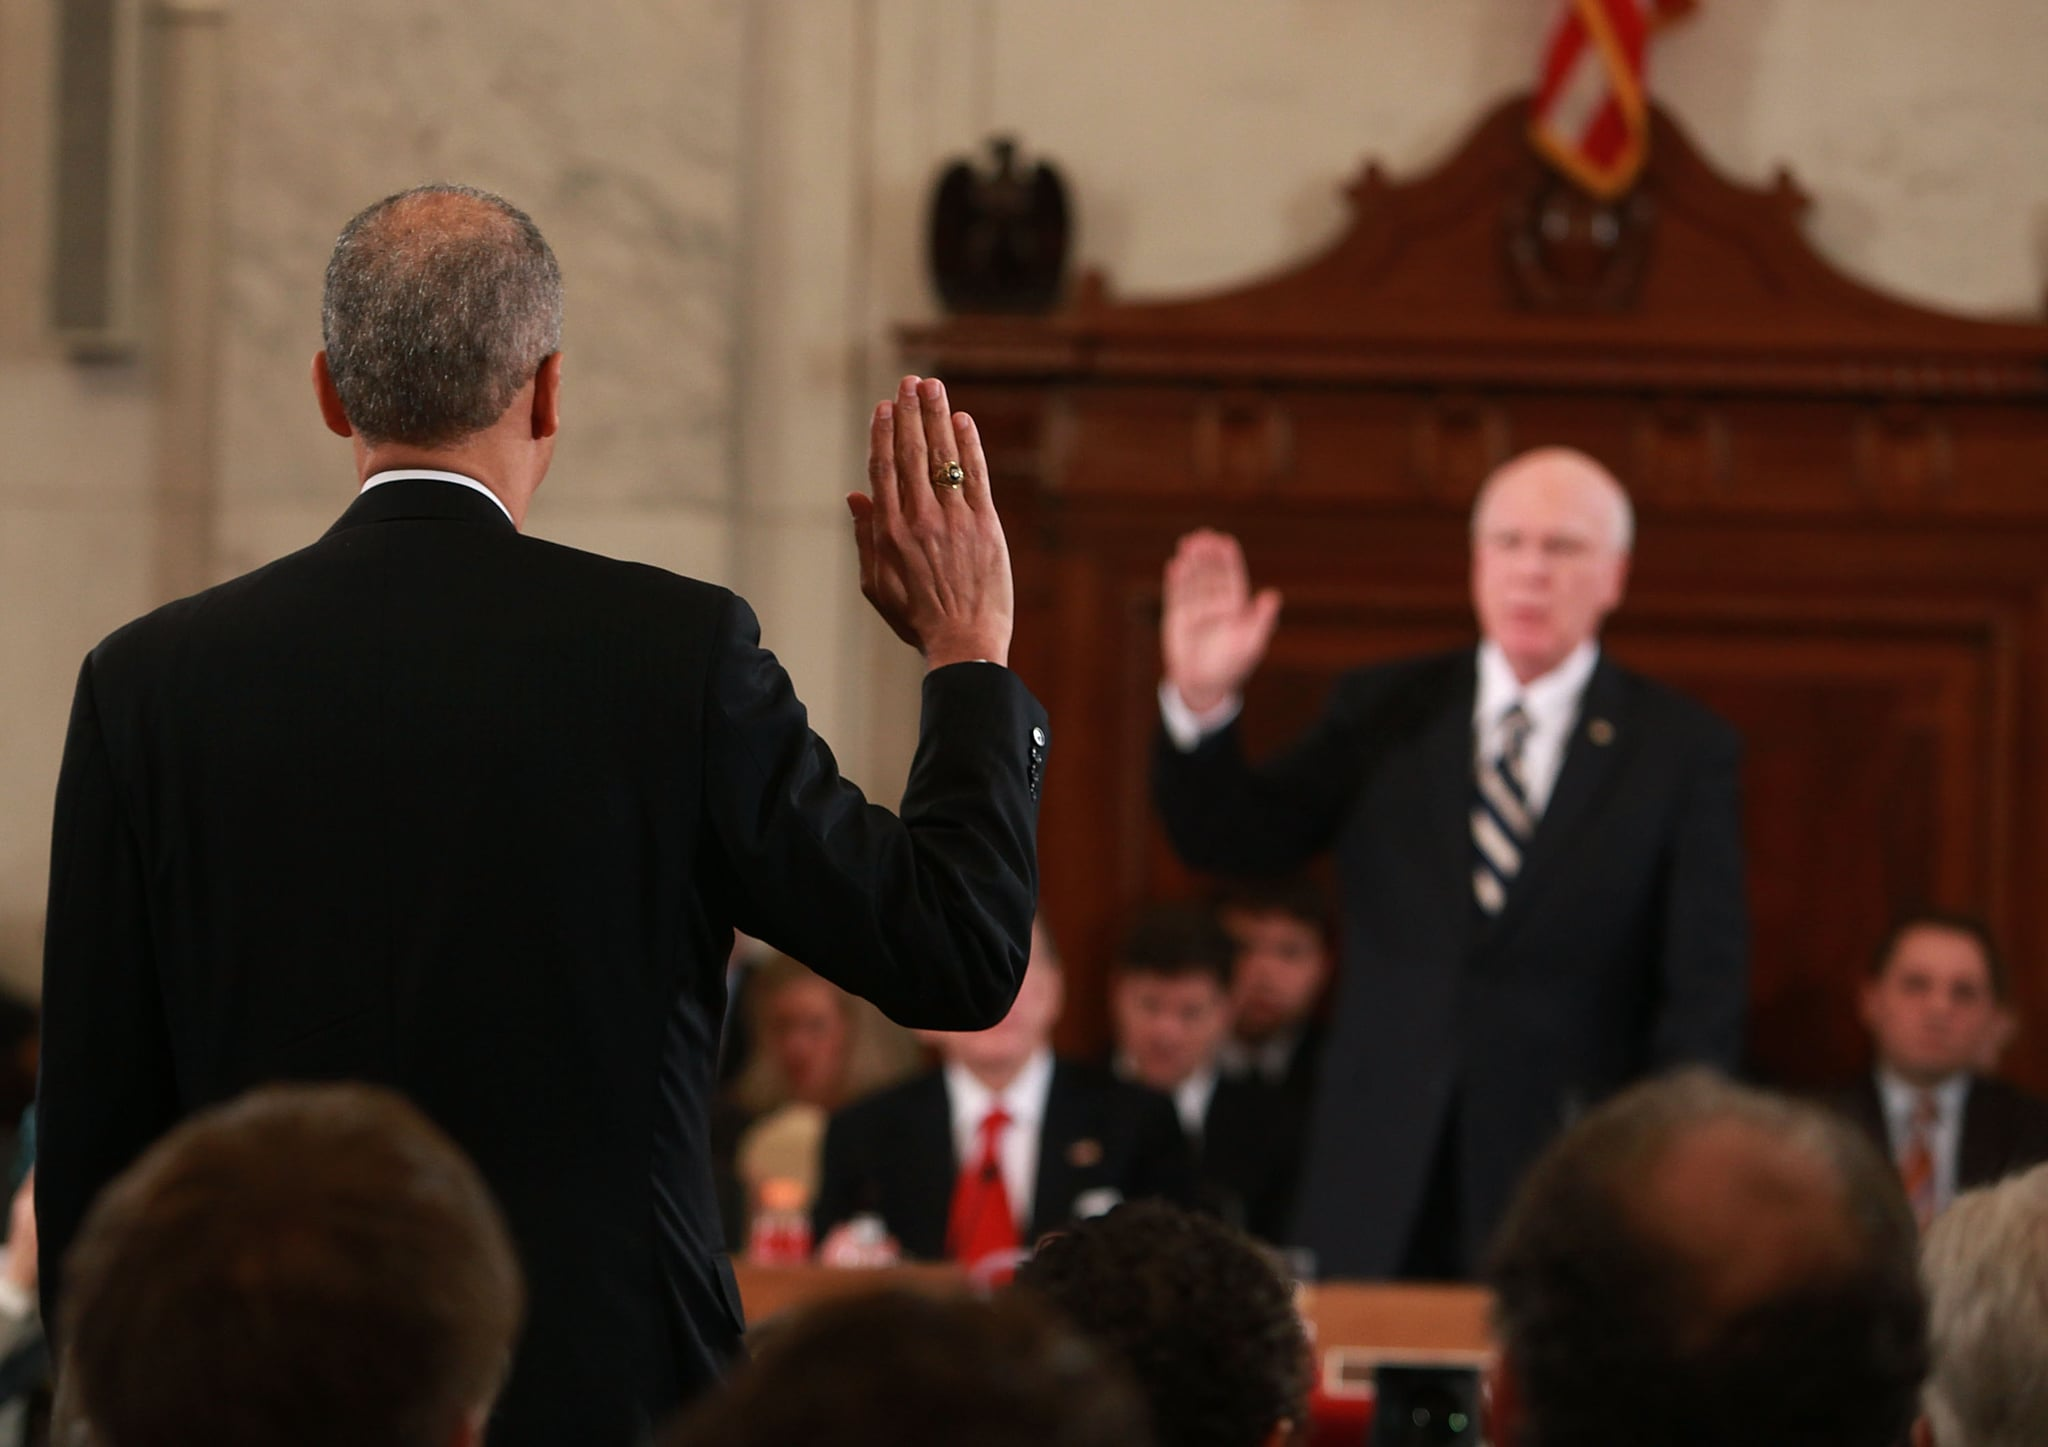 Attorney General nominee Eric Holder is sworn in.